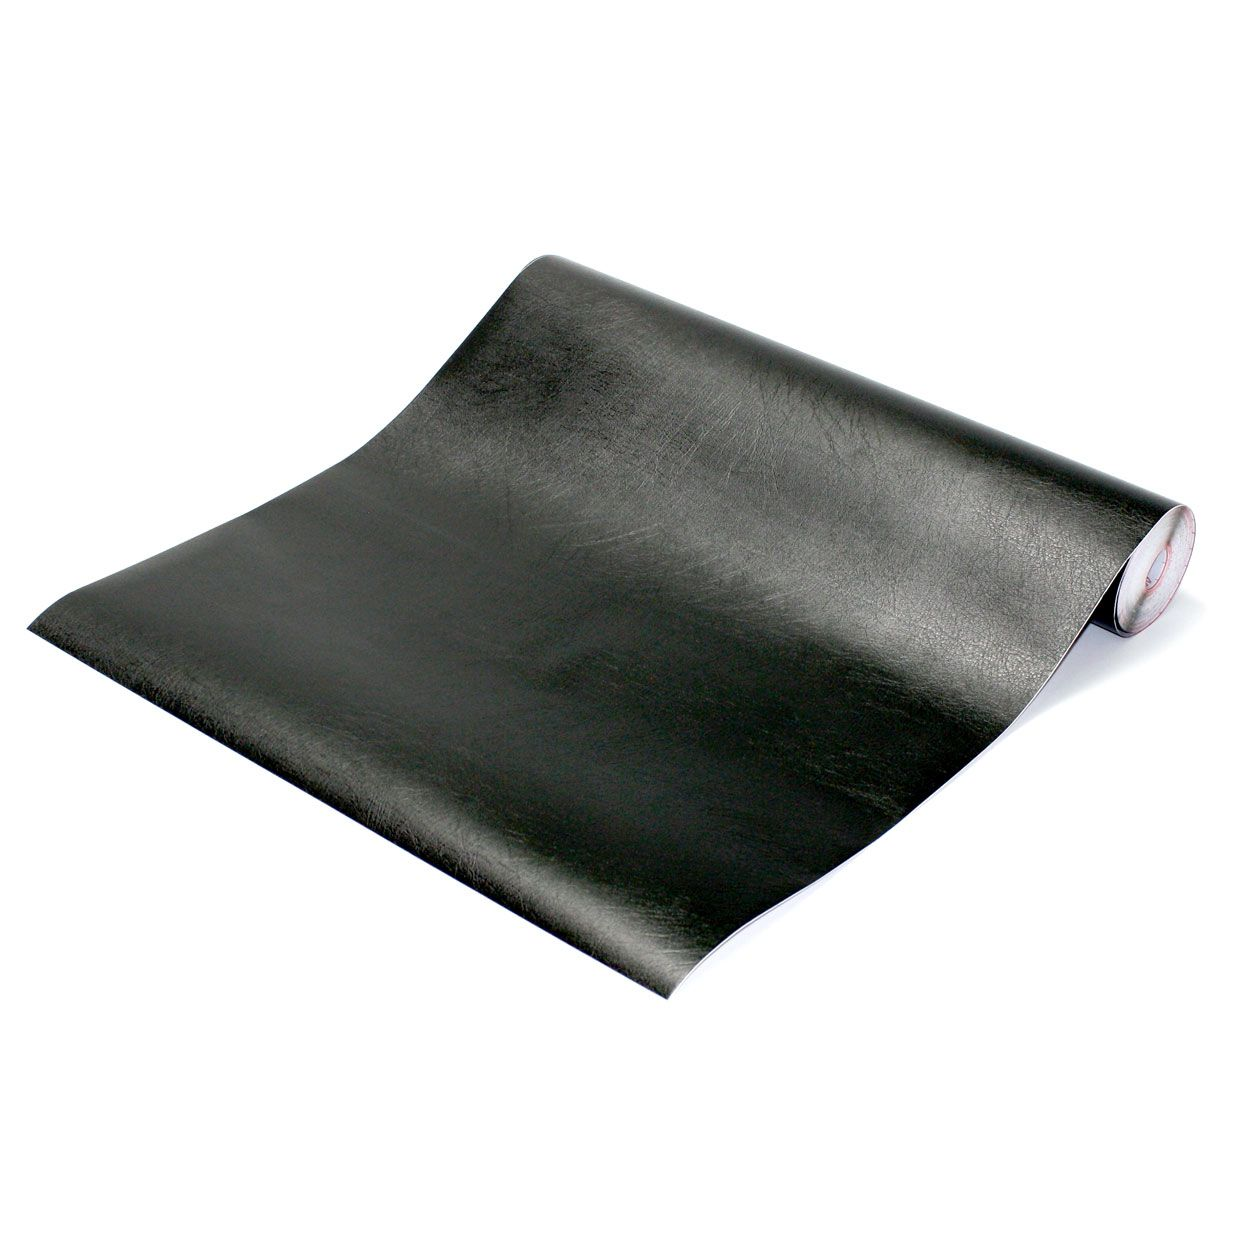 Faux Leather Black Self Adhesive Decorative Contact Paper 200x1923 Decorative Self Adhesive Vinyl Contact Paper Burke Decor Modern Wallpaper Designs Leather